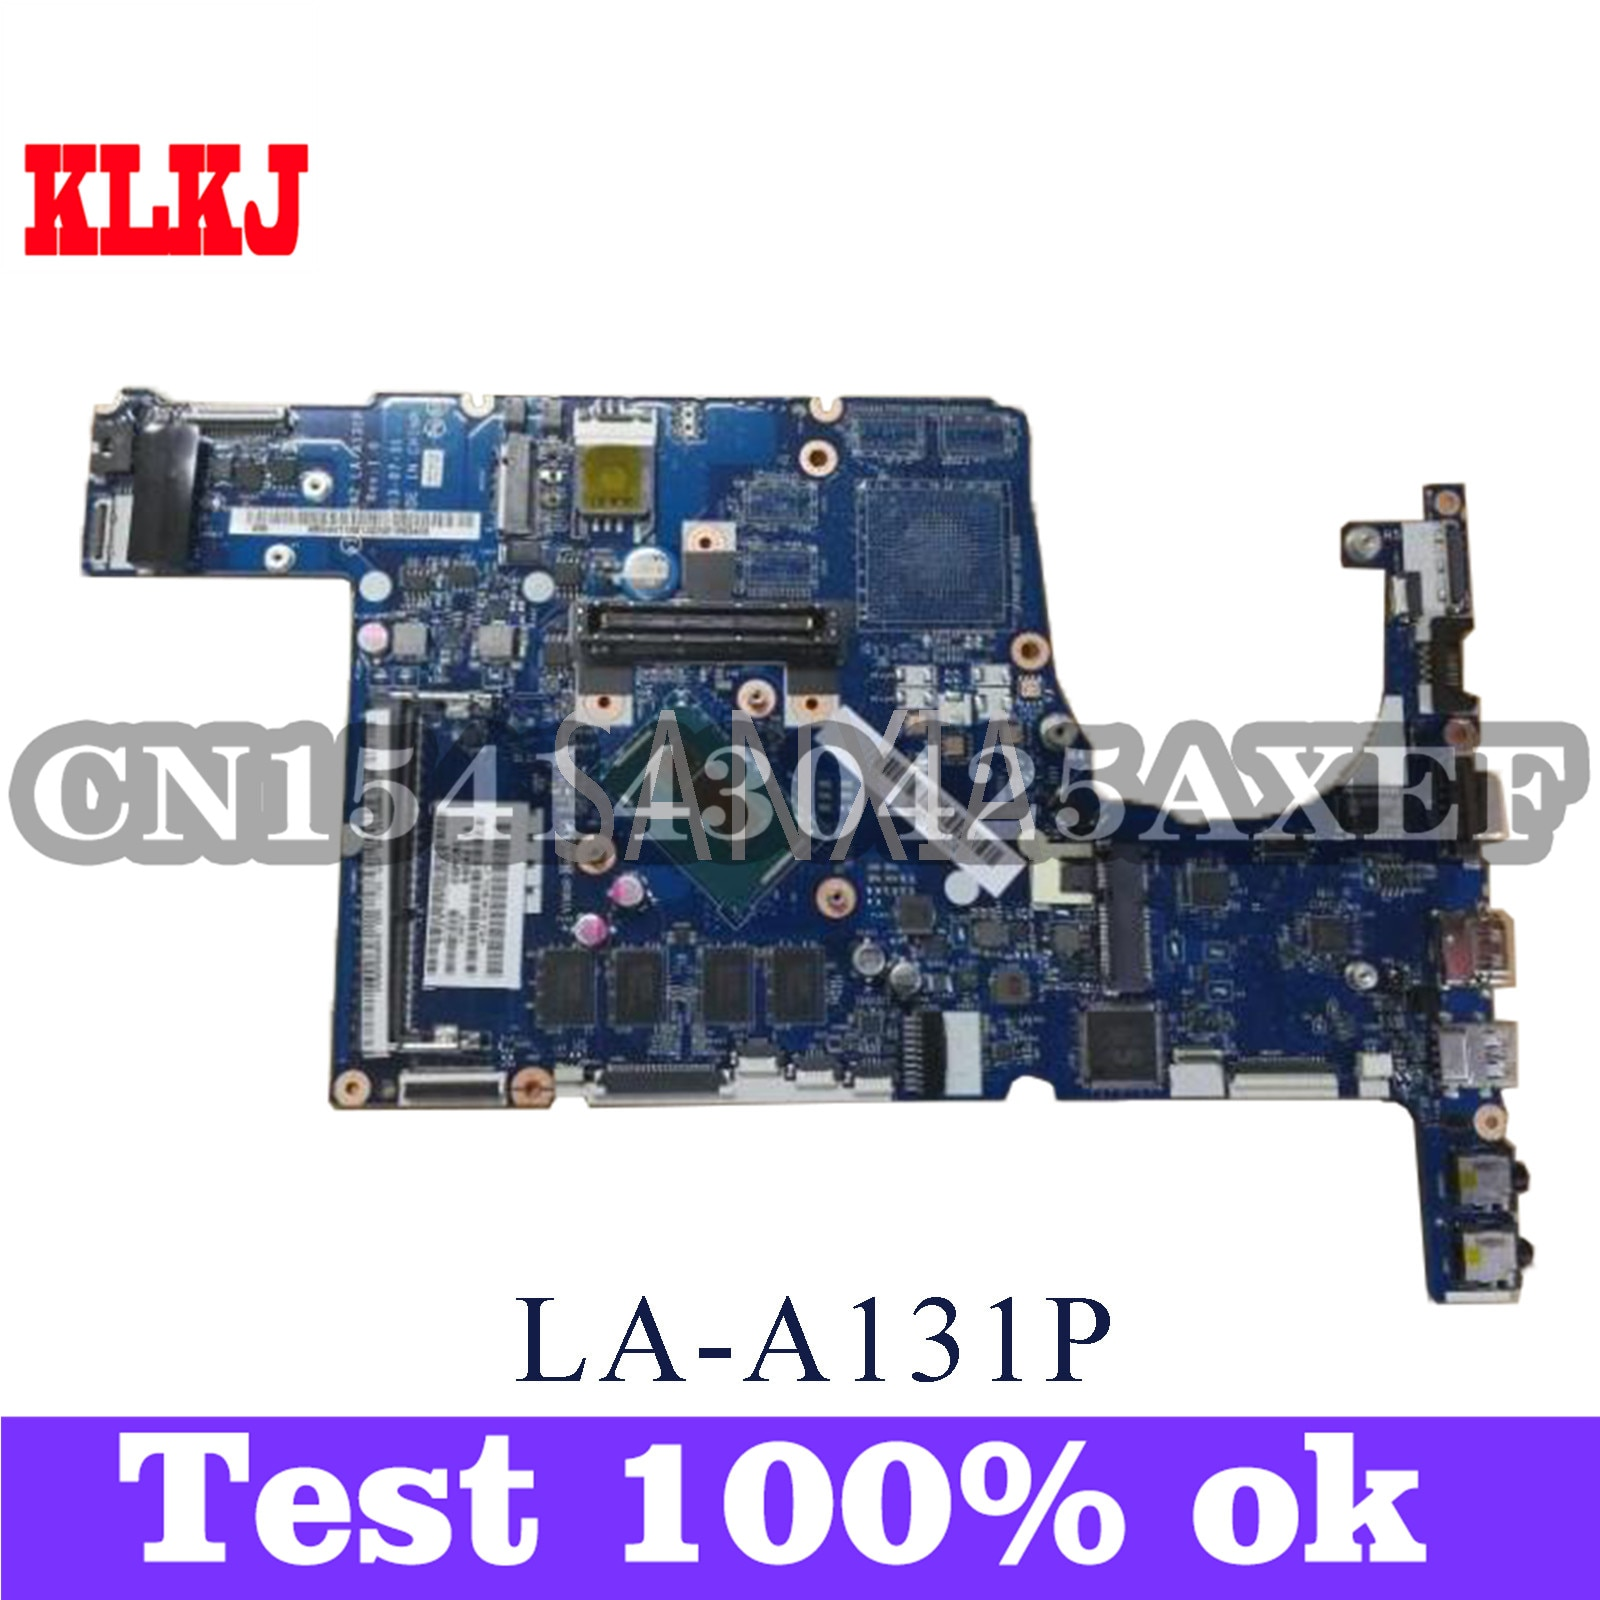 KLKJ LA-A131P اللوحة الأم للكمبيوتر المحمول لشركة أيسر TMP645-MG Travelmate-P645 الأصلي 4GB-RAM I7-4500U